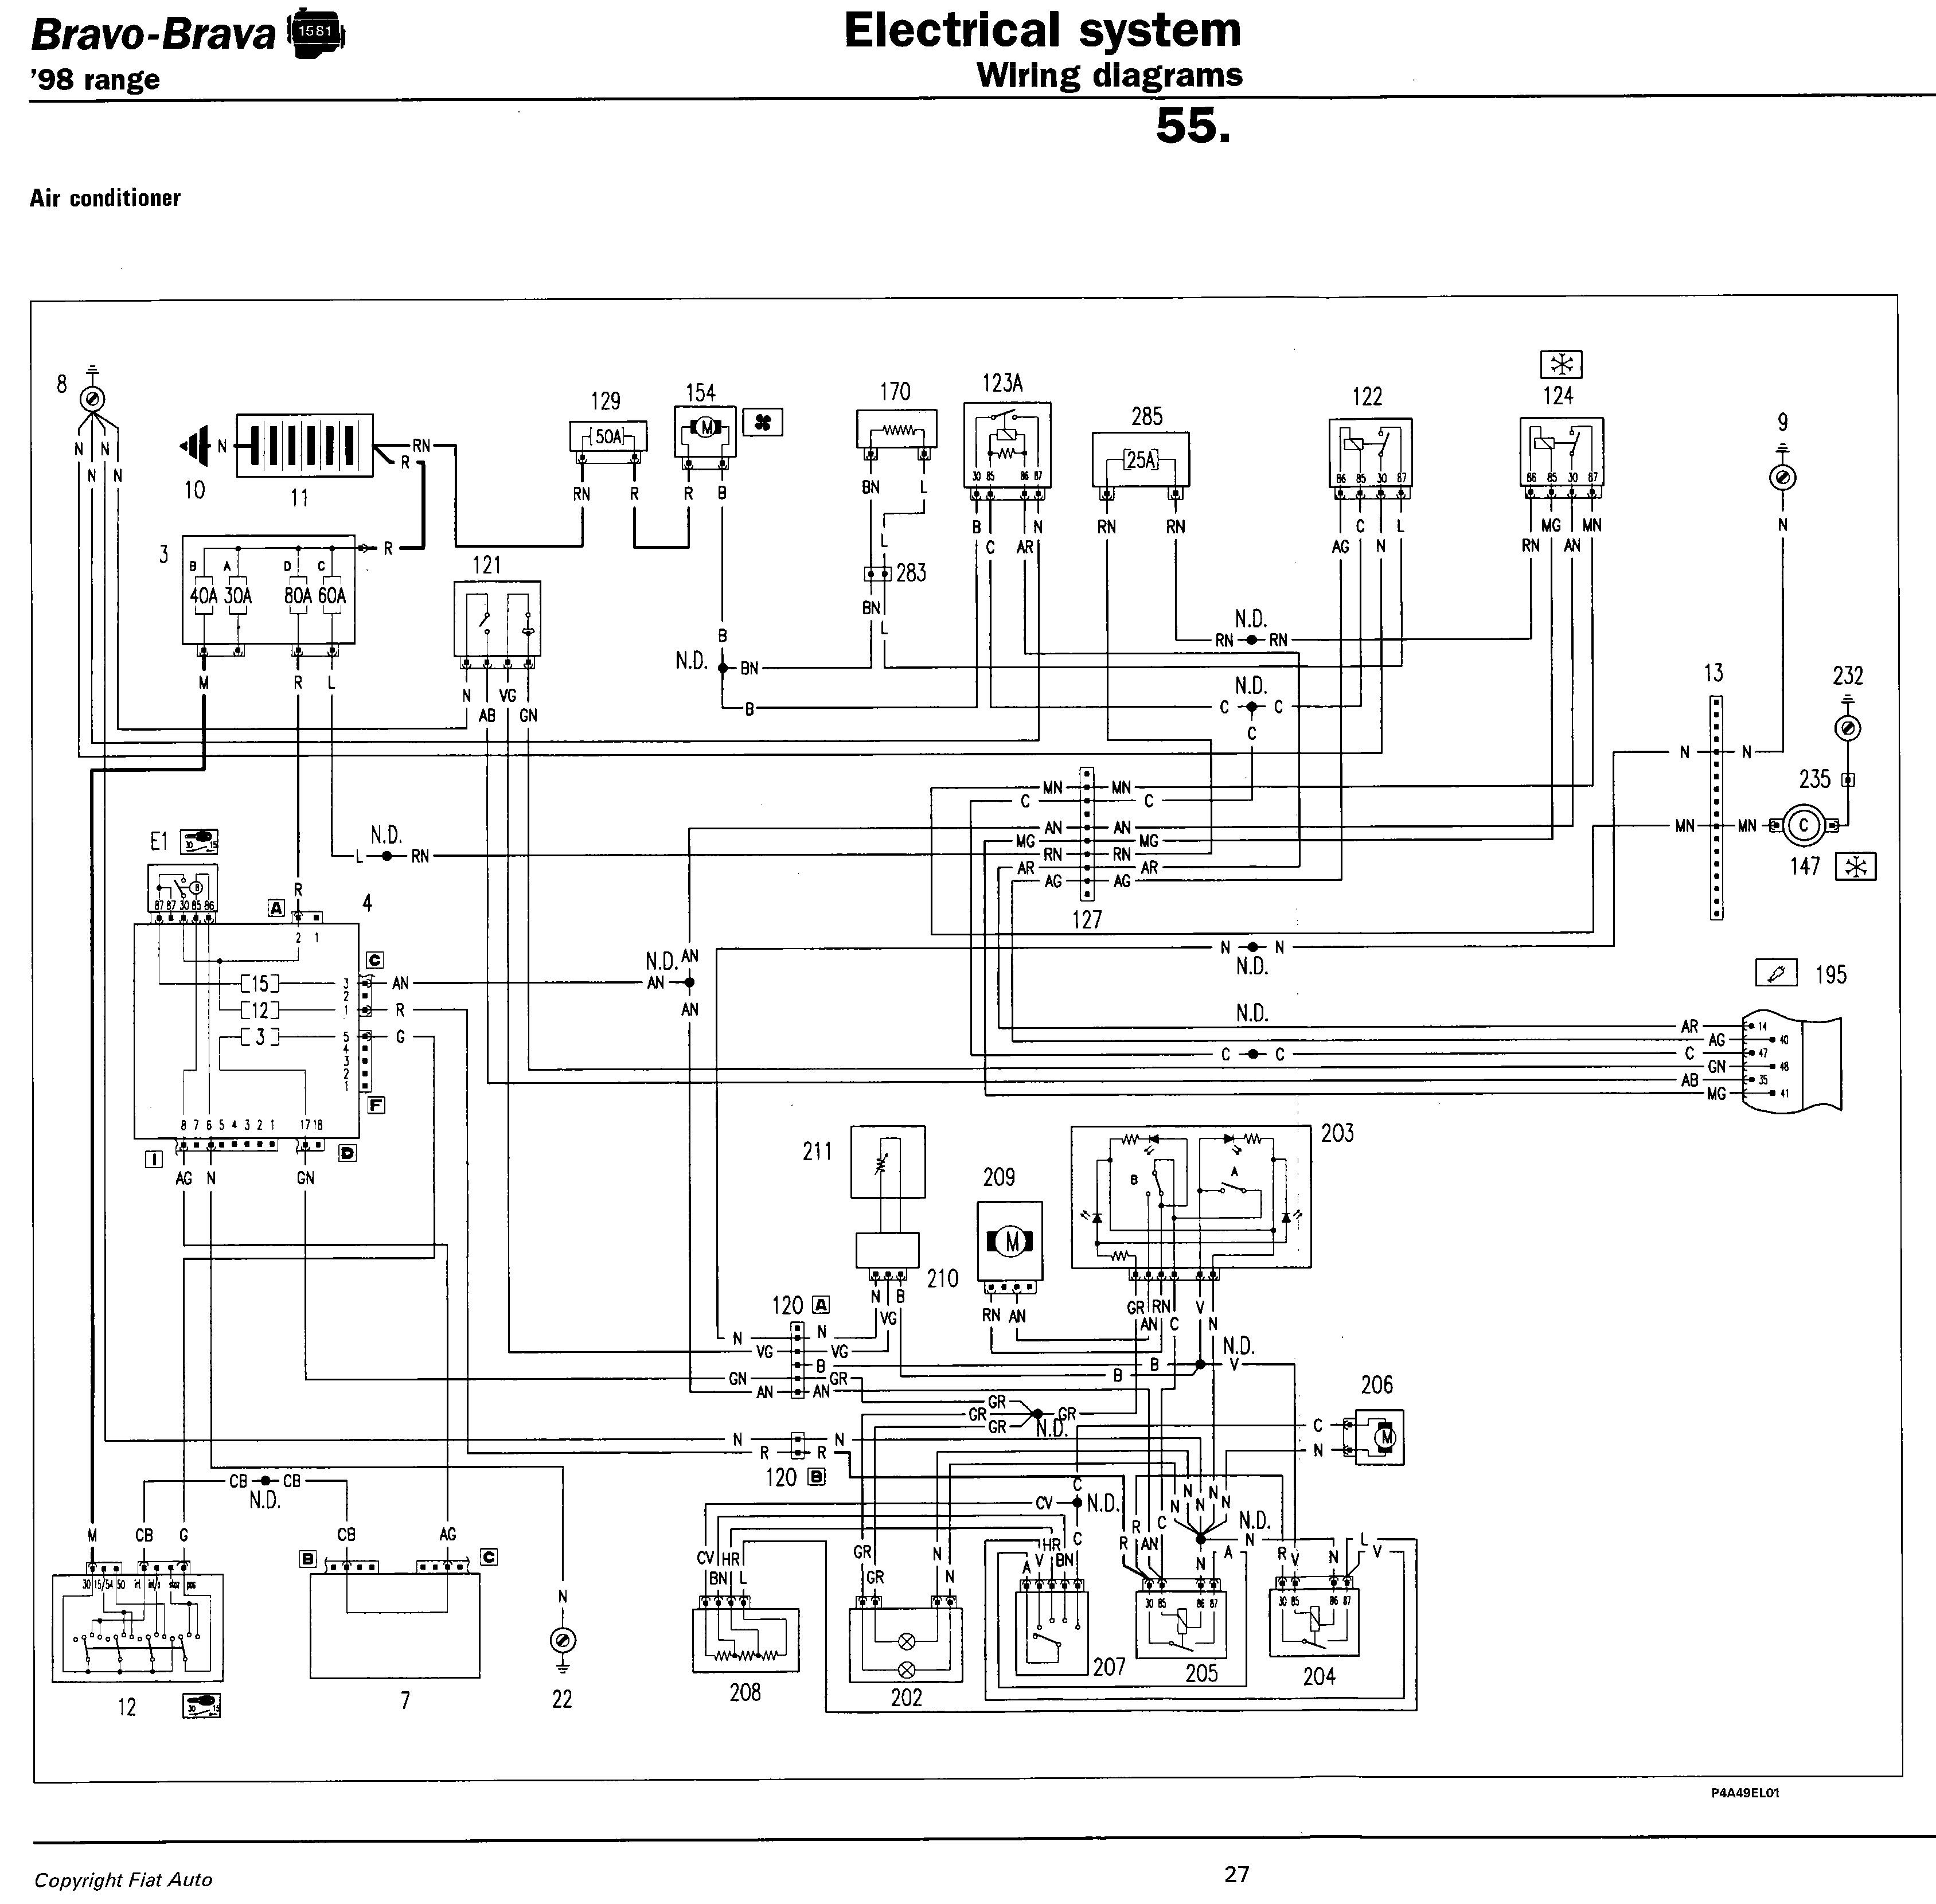 1998 Ski Doo Wiring Diagram Electrical Schematics Diagrams 1989 Sea